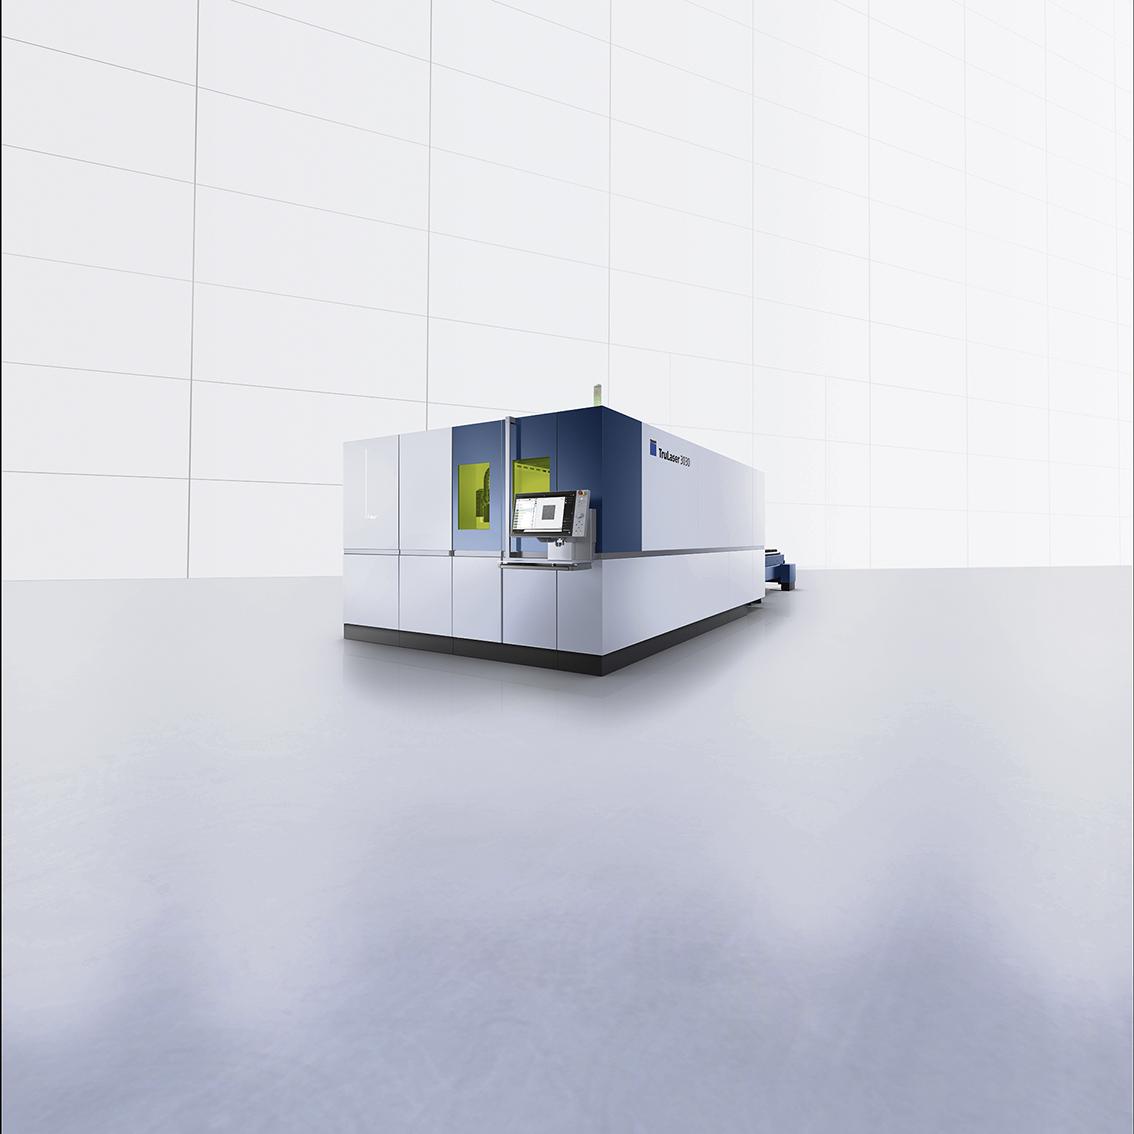 Fiberlaser Trulaser 3030, 8 kxW.